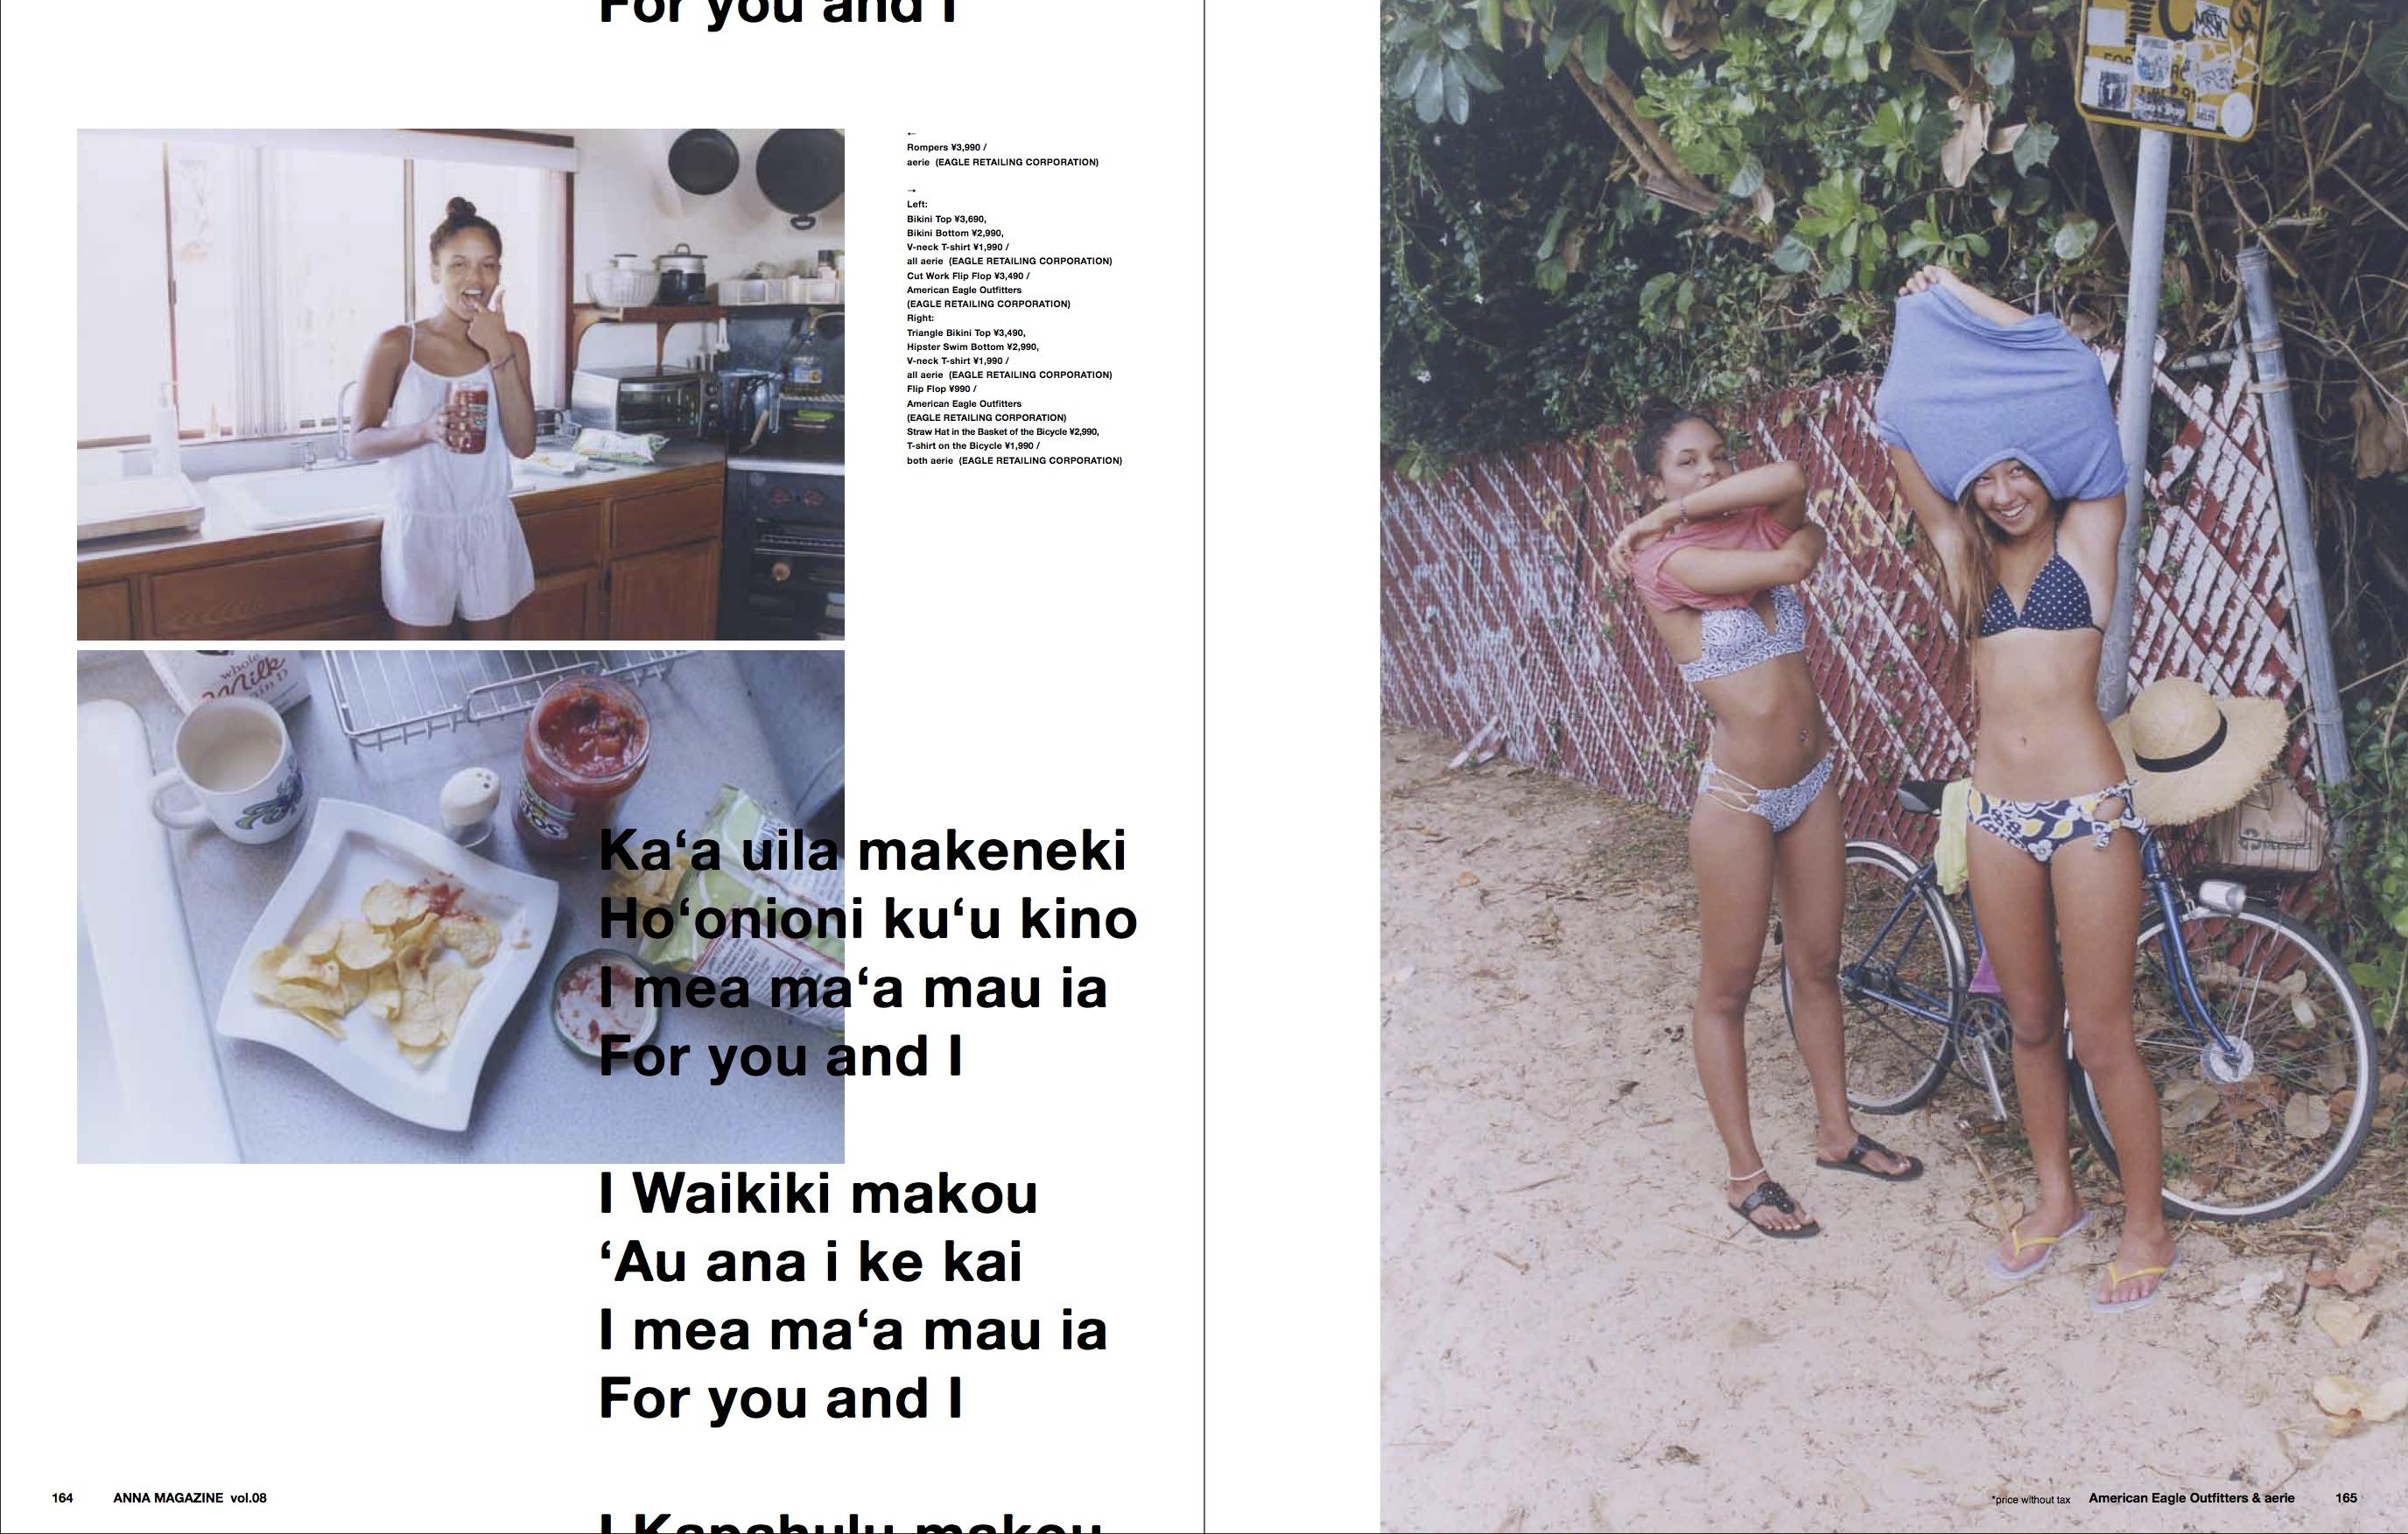 anna magazine vol.8 P82